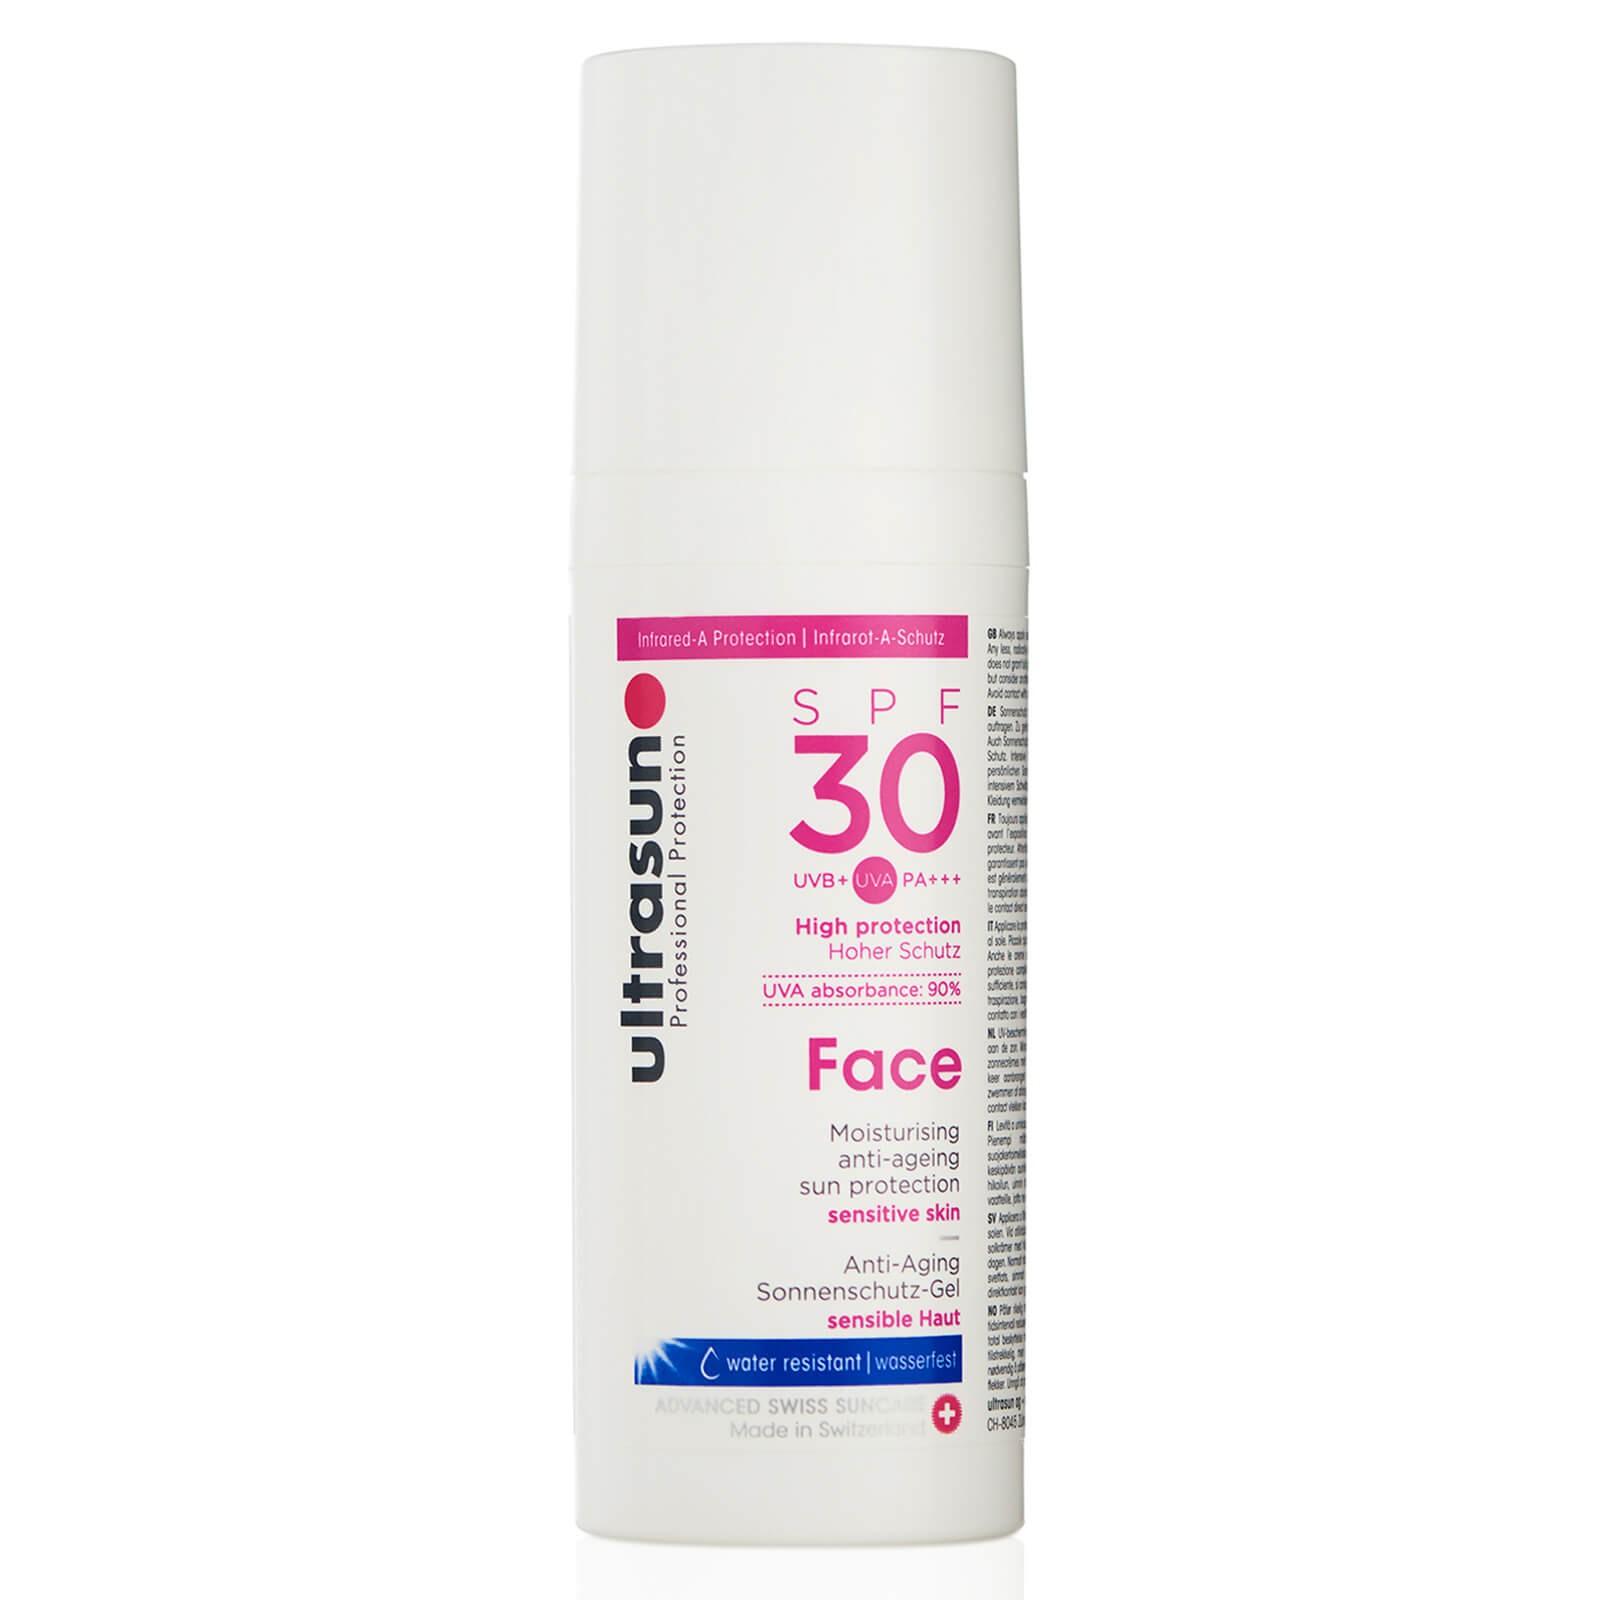 Ultrasun 抗光老化日常防晒霜 SPF30 50ml